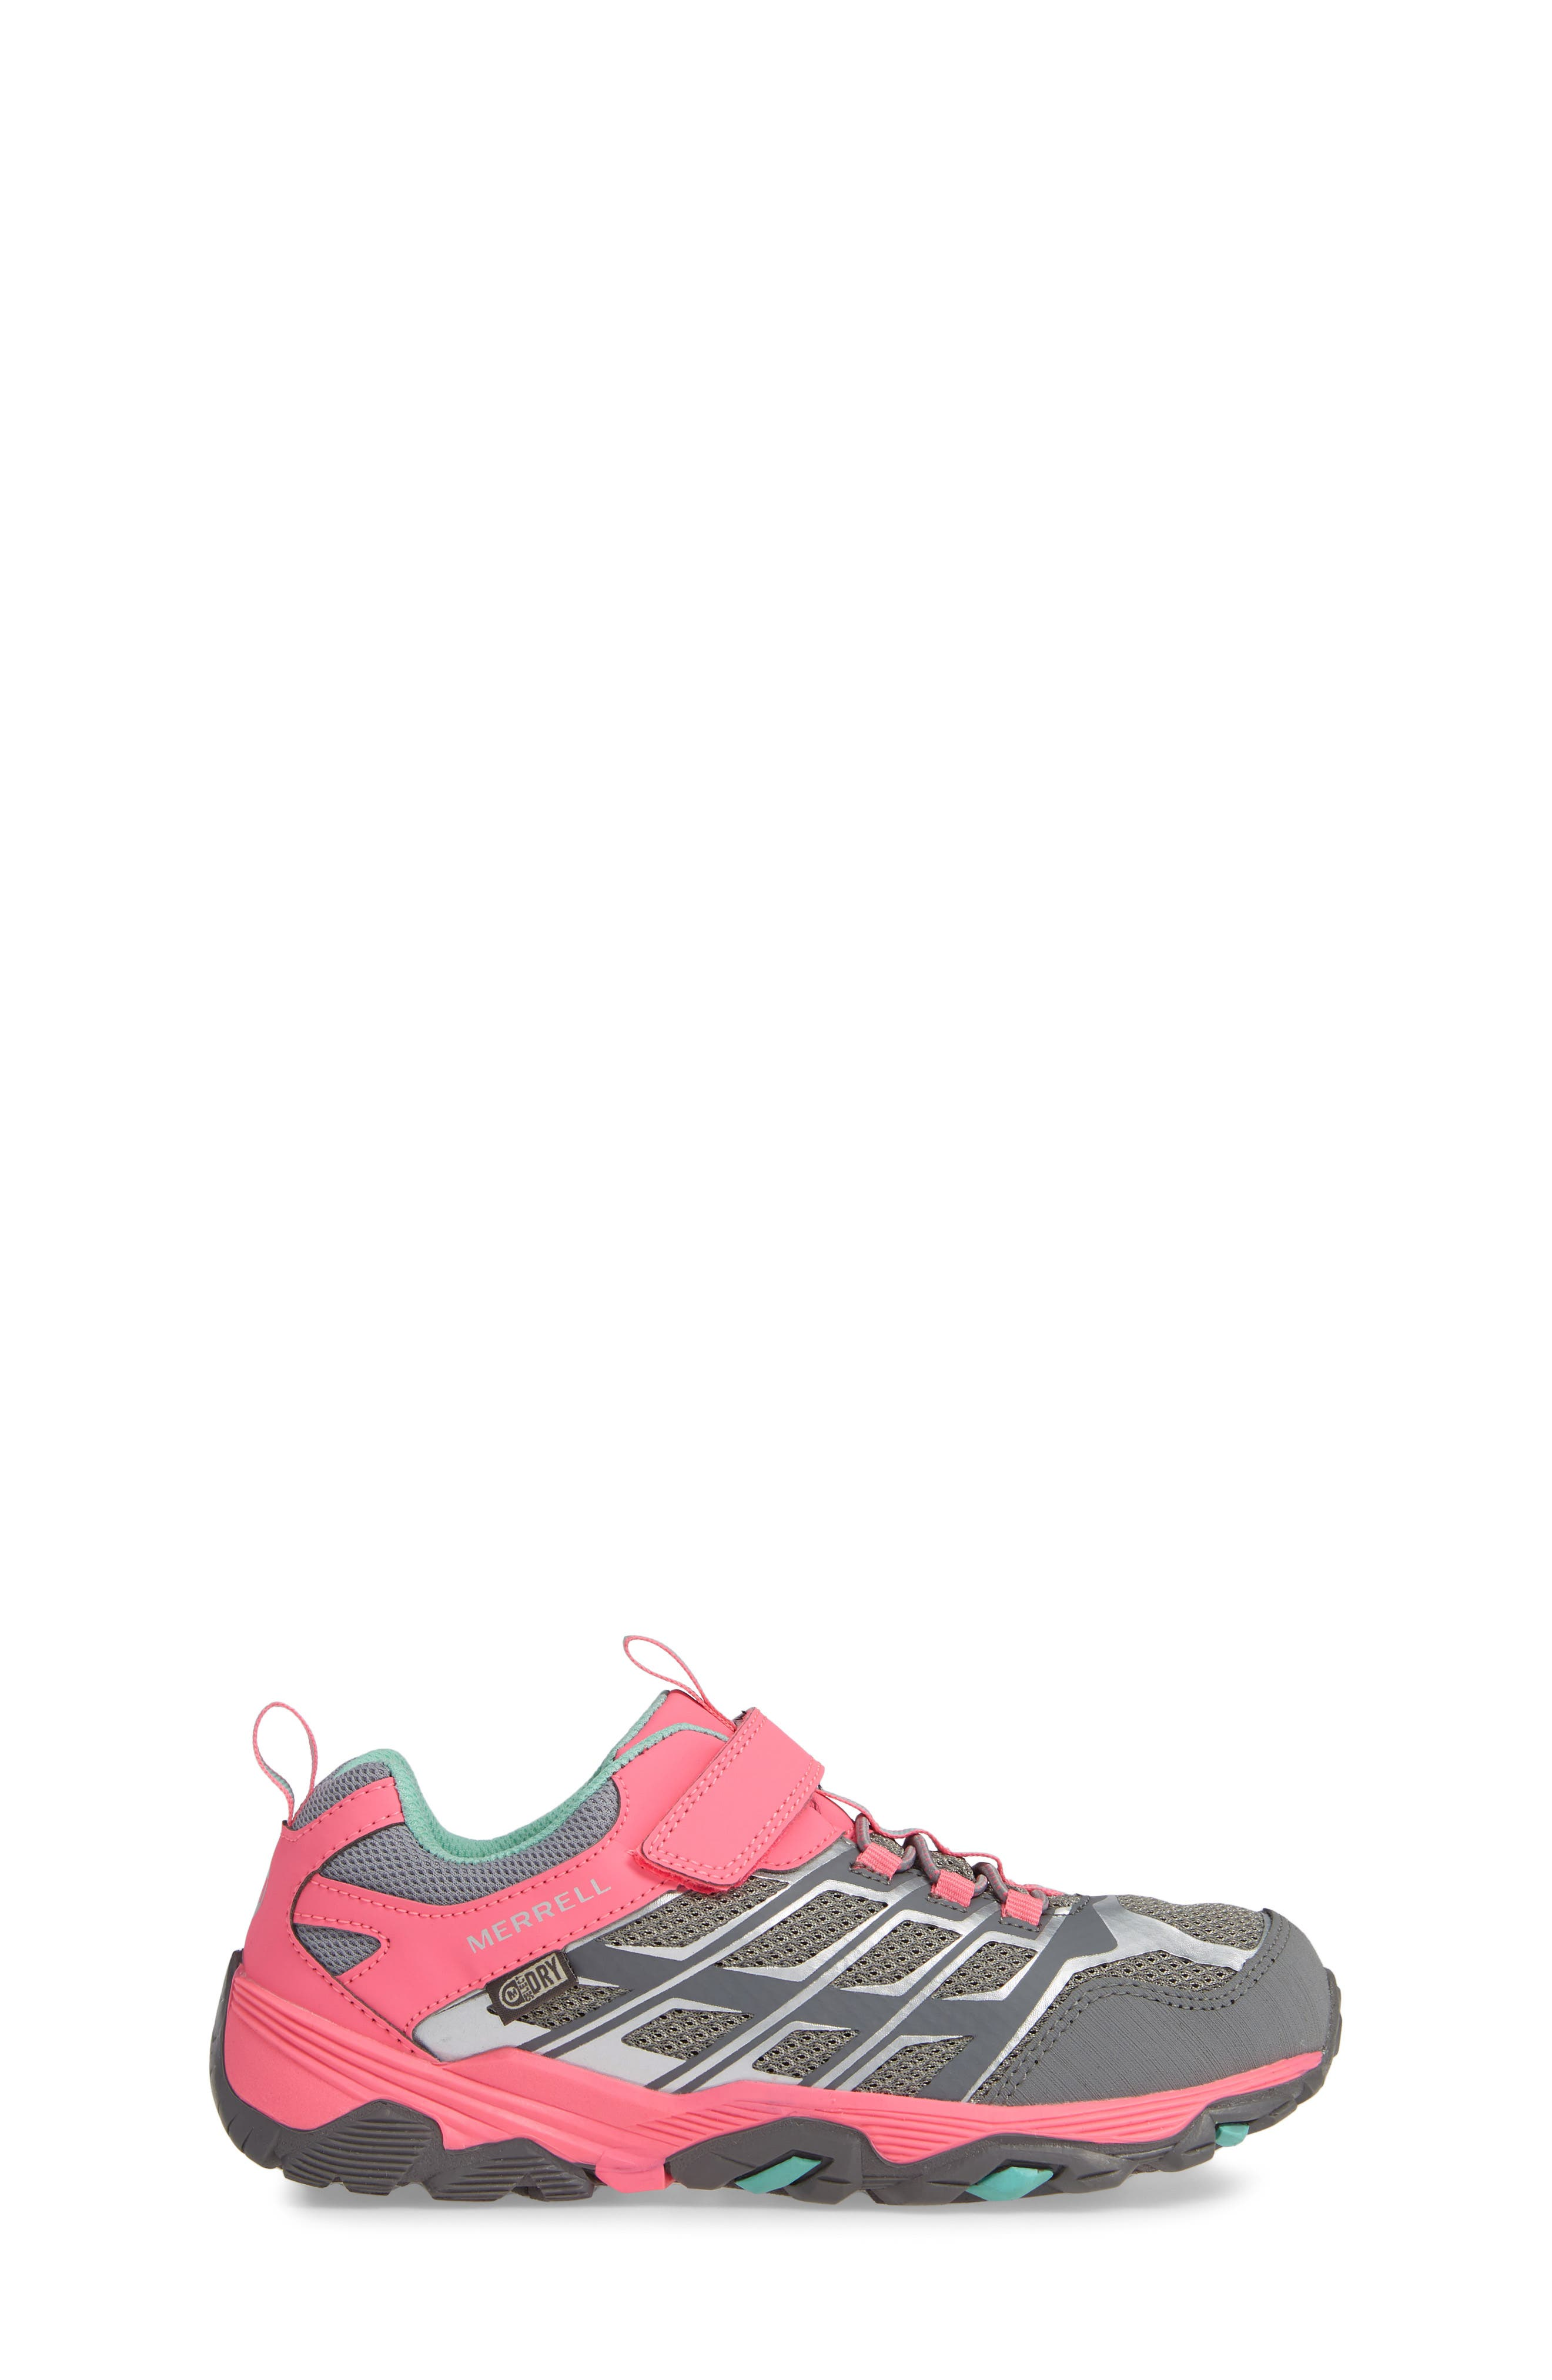 Moab FST Polar Low Waterproof Sneaker,                             Alternate thumbnail 3, color,                             GREY/ CORAL